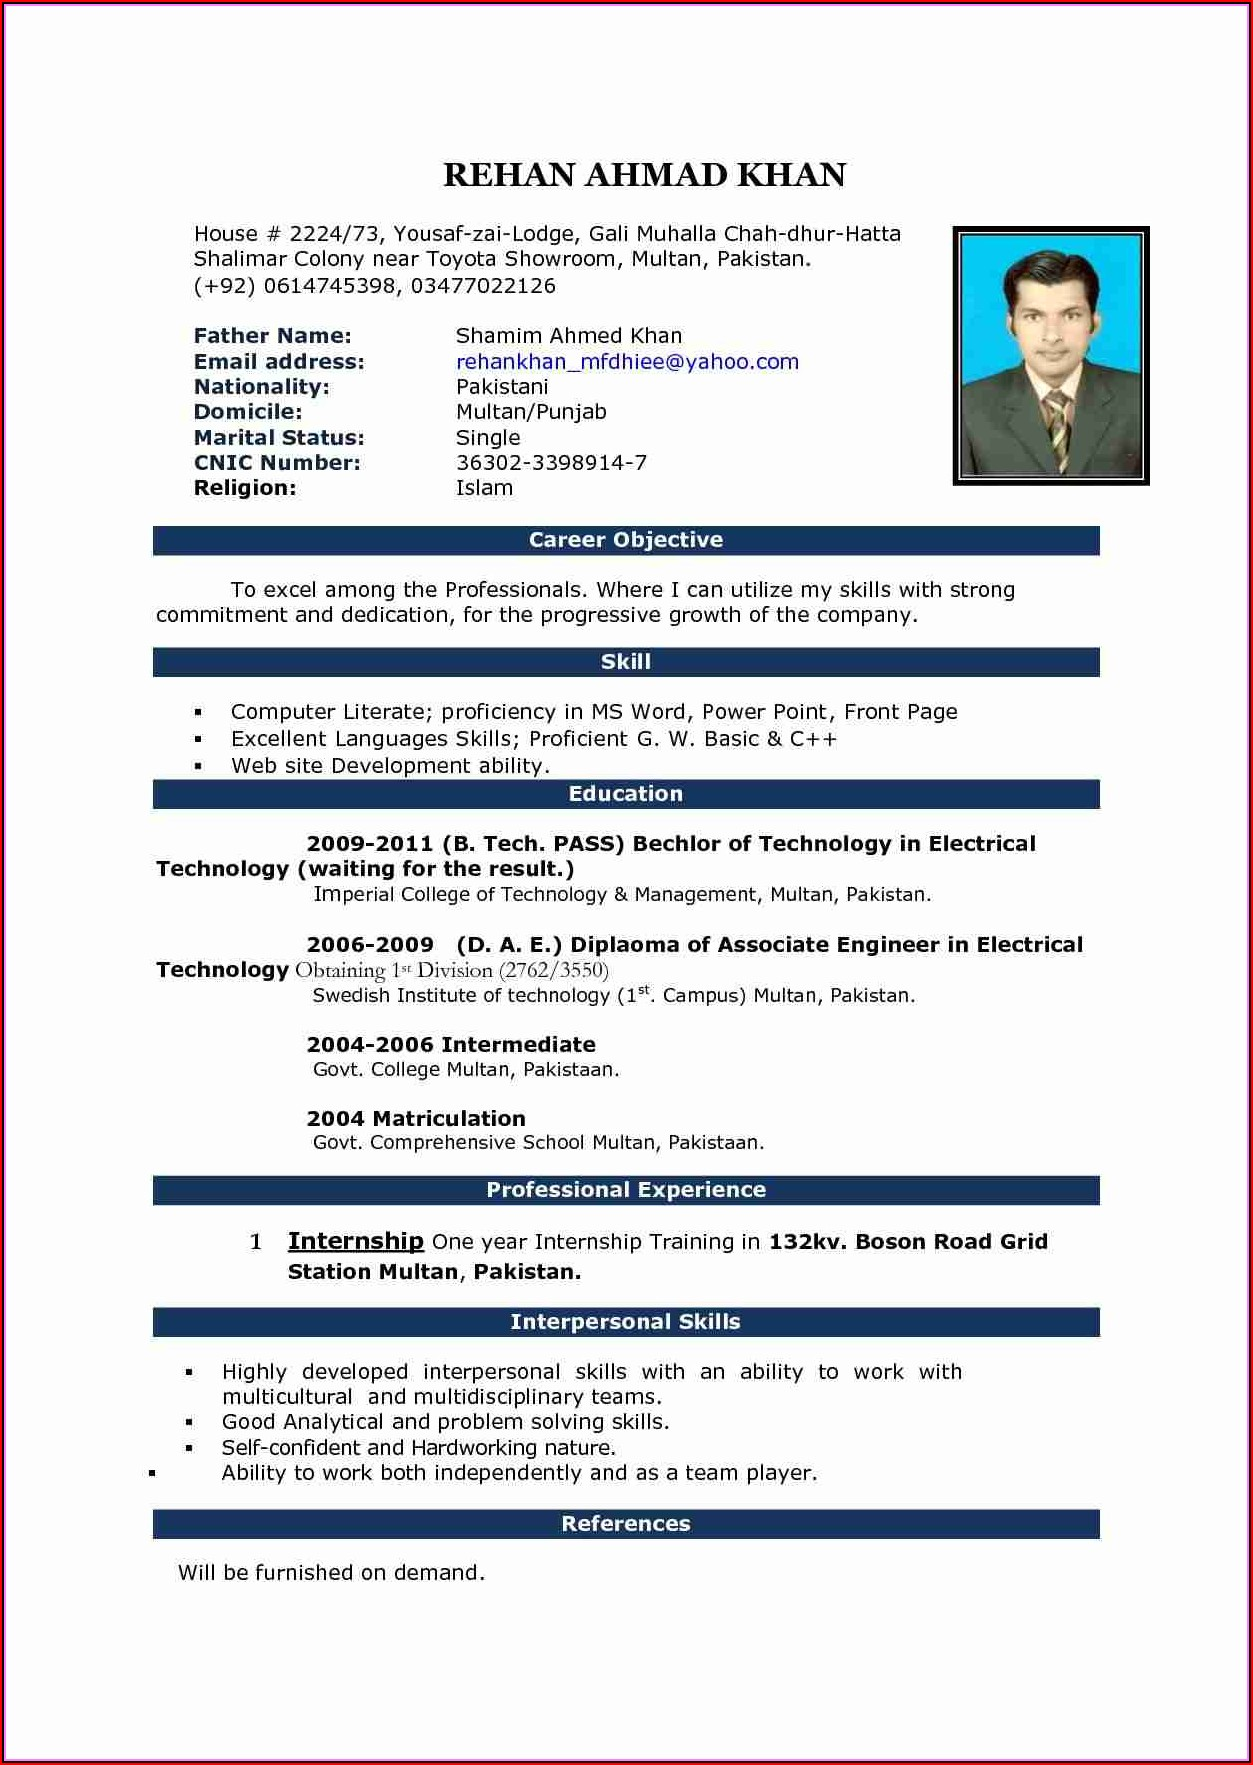 Sample Resume In Word Format Download